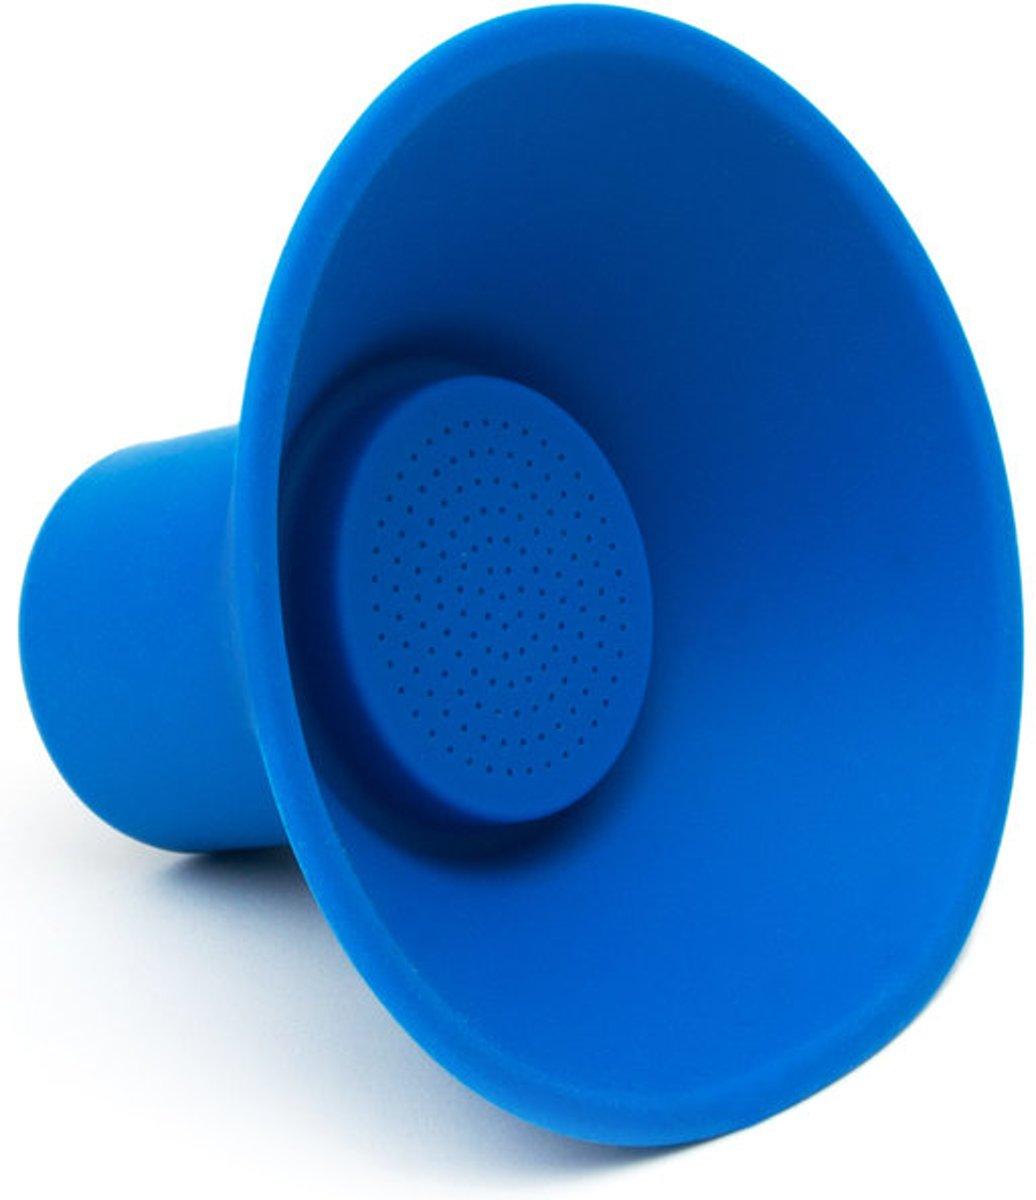 Portable blue icon speaker - Draadloze bluetooth speaker  - BLAUW kopen